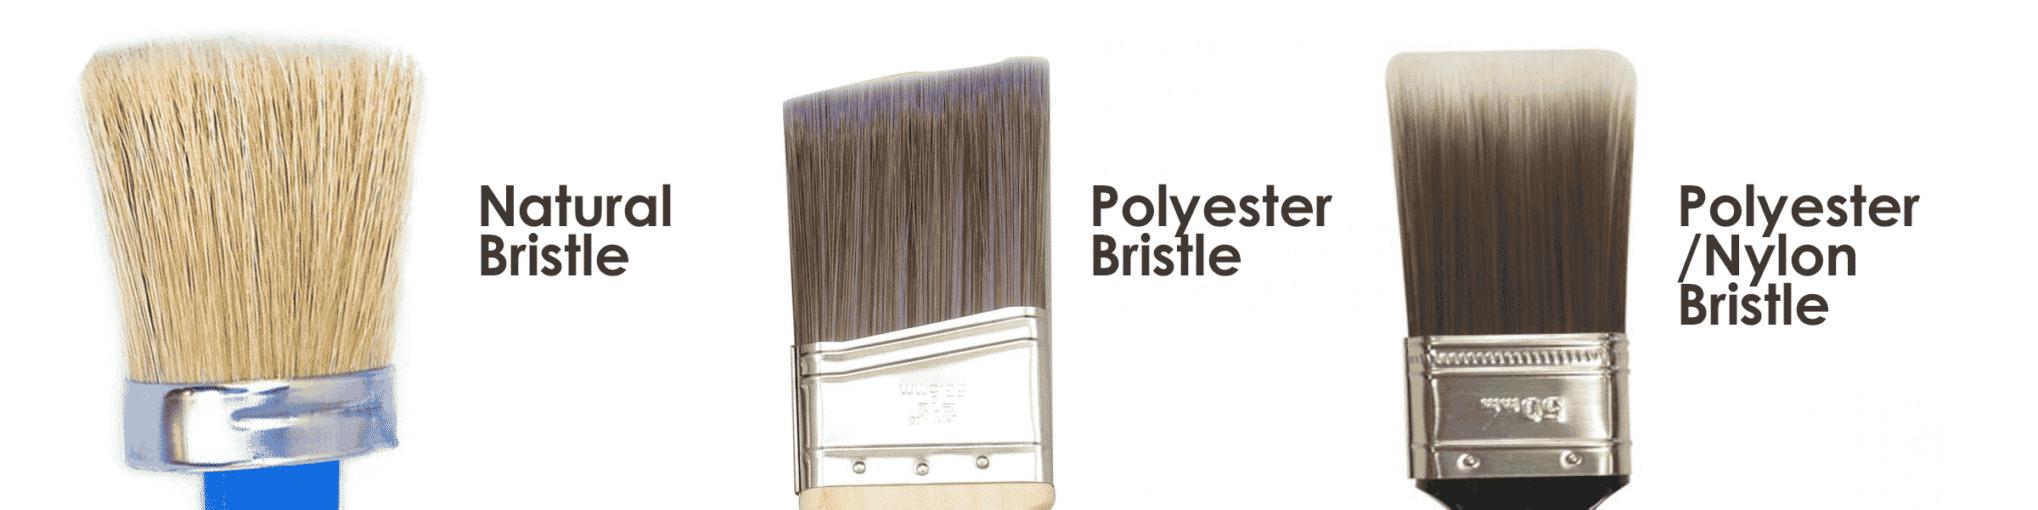 Different Brush Types: Natural Bristle, Polyester Bristle, Polyester/Nylon Bristle